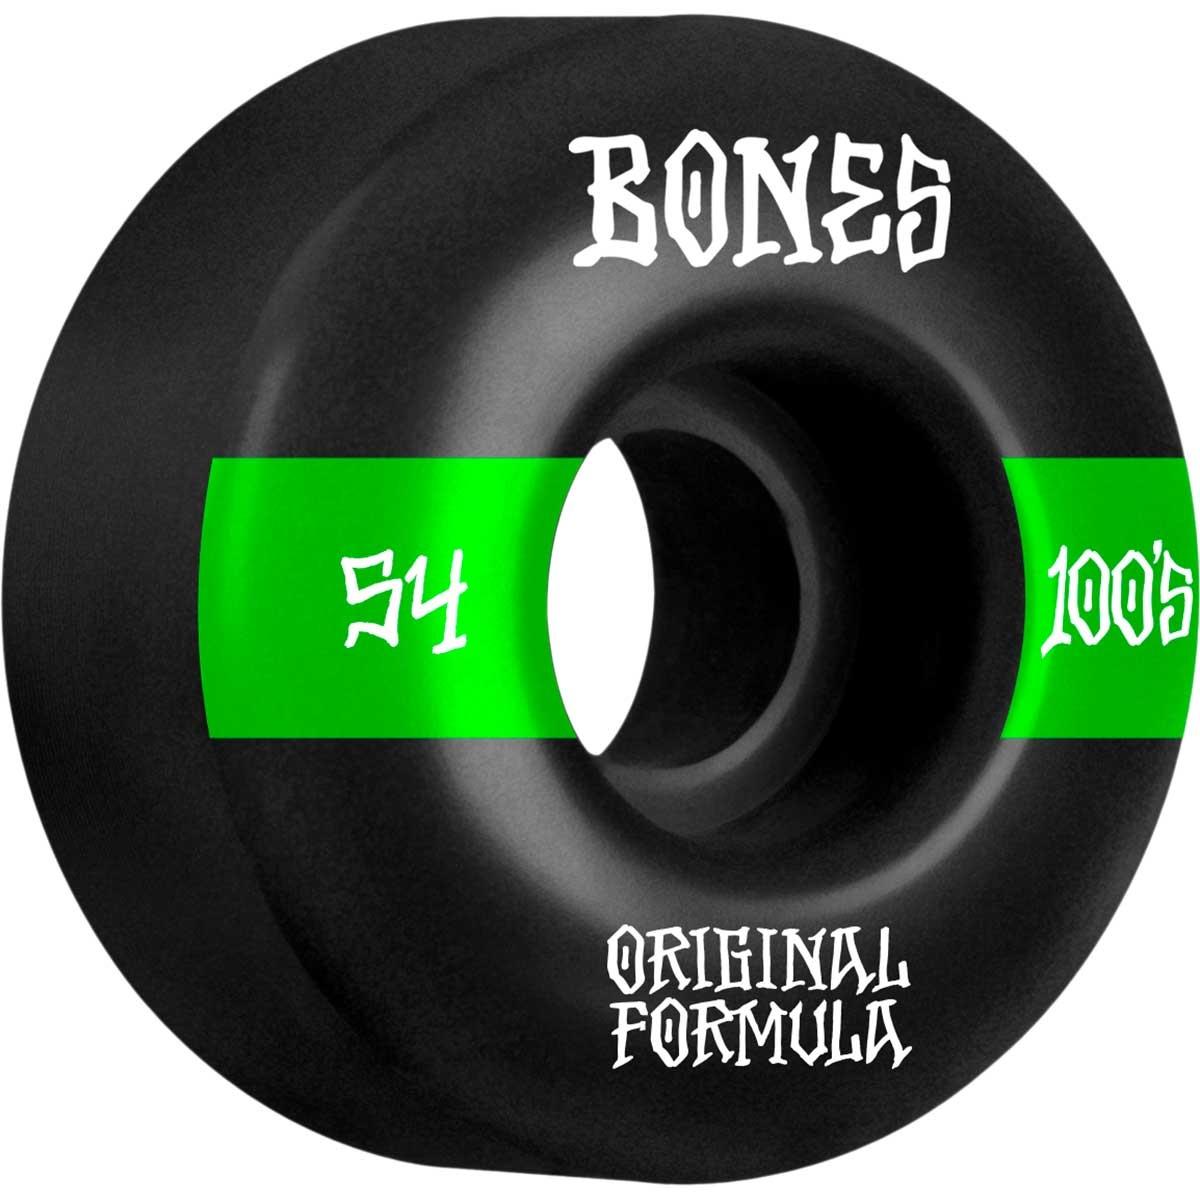 bones 100s v4 wide 54mm black wheels